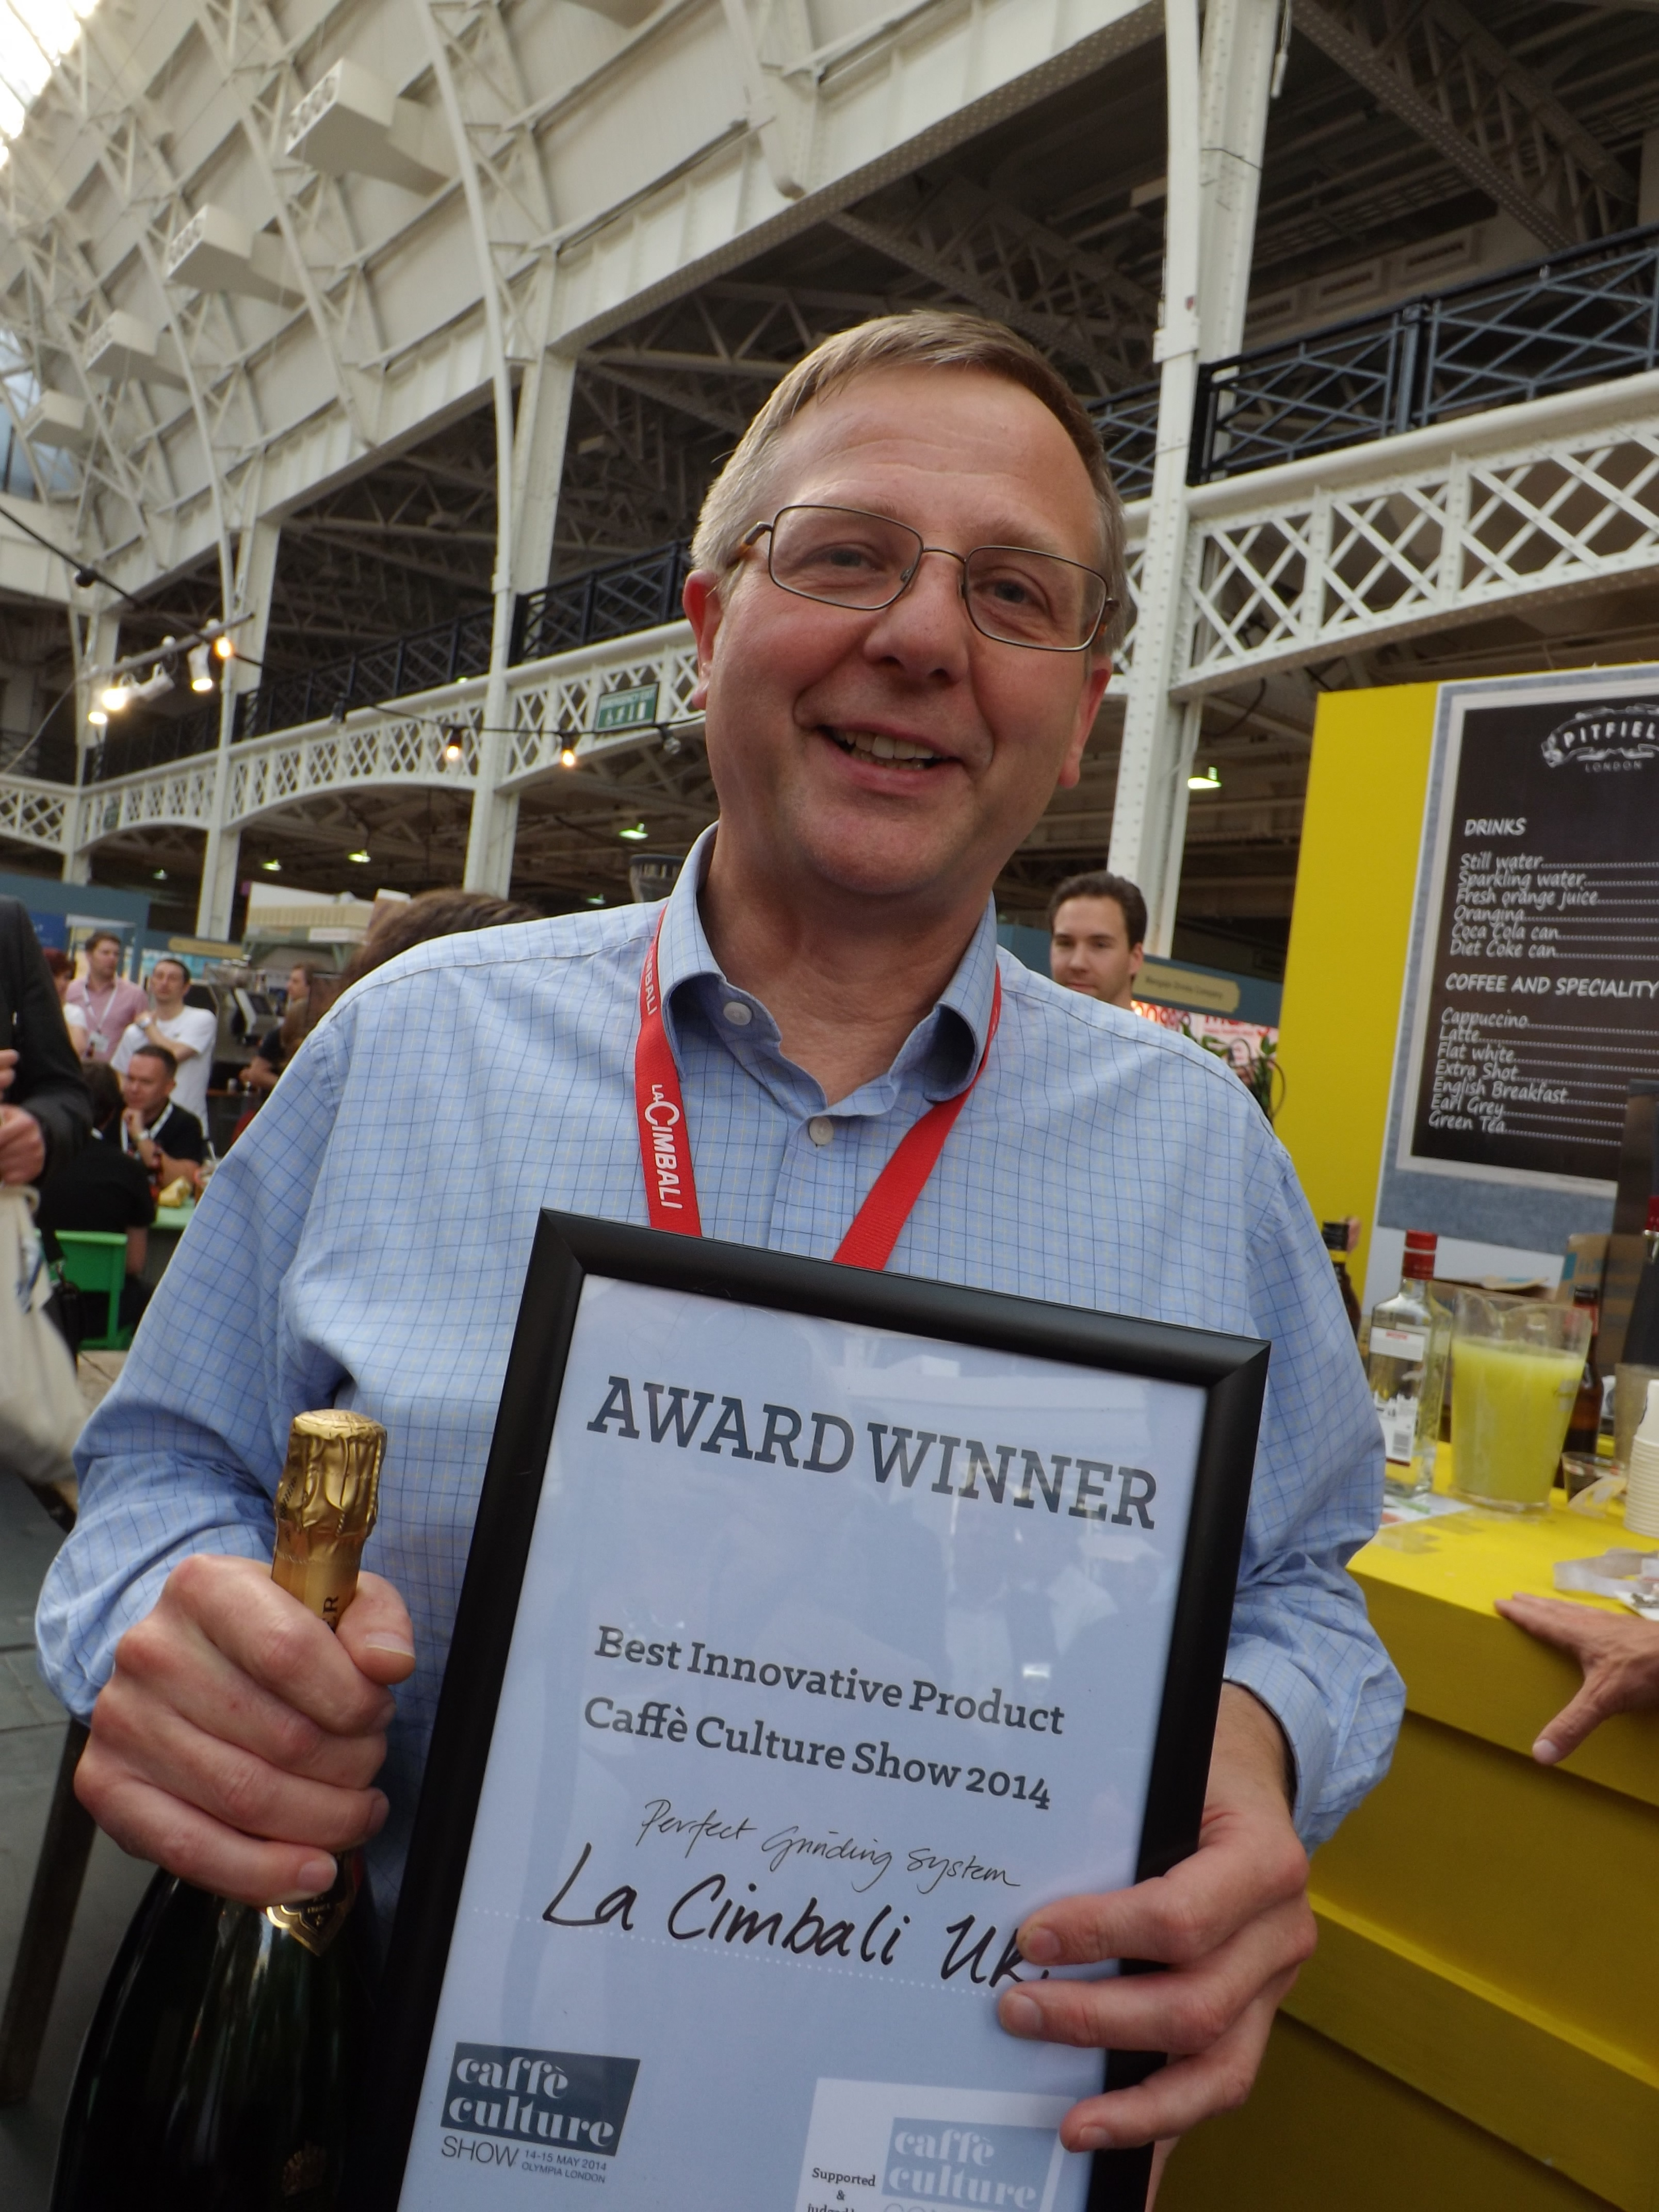 Carl Bjorkstrand - Cimbali UK Best Innovative Product Cafe Culture Show